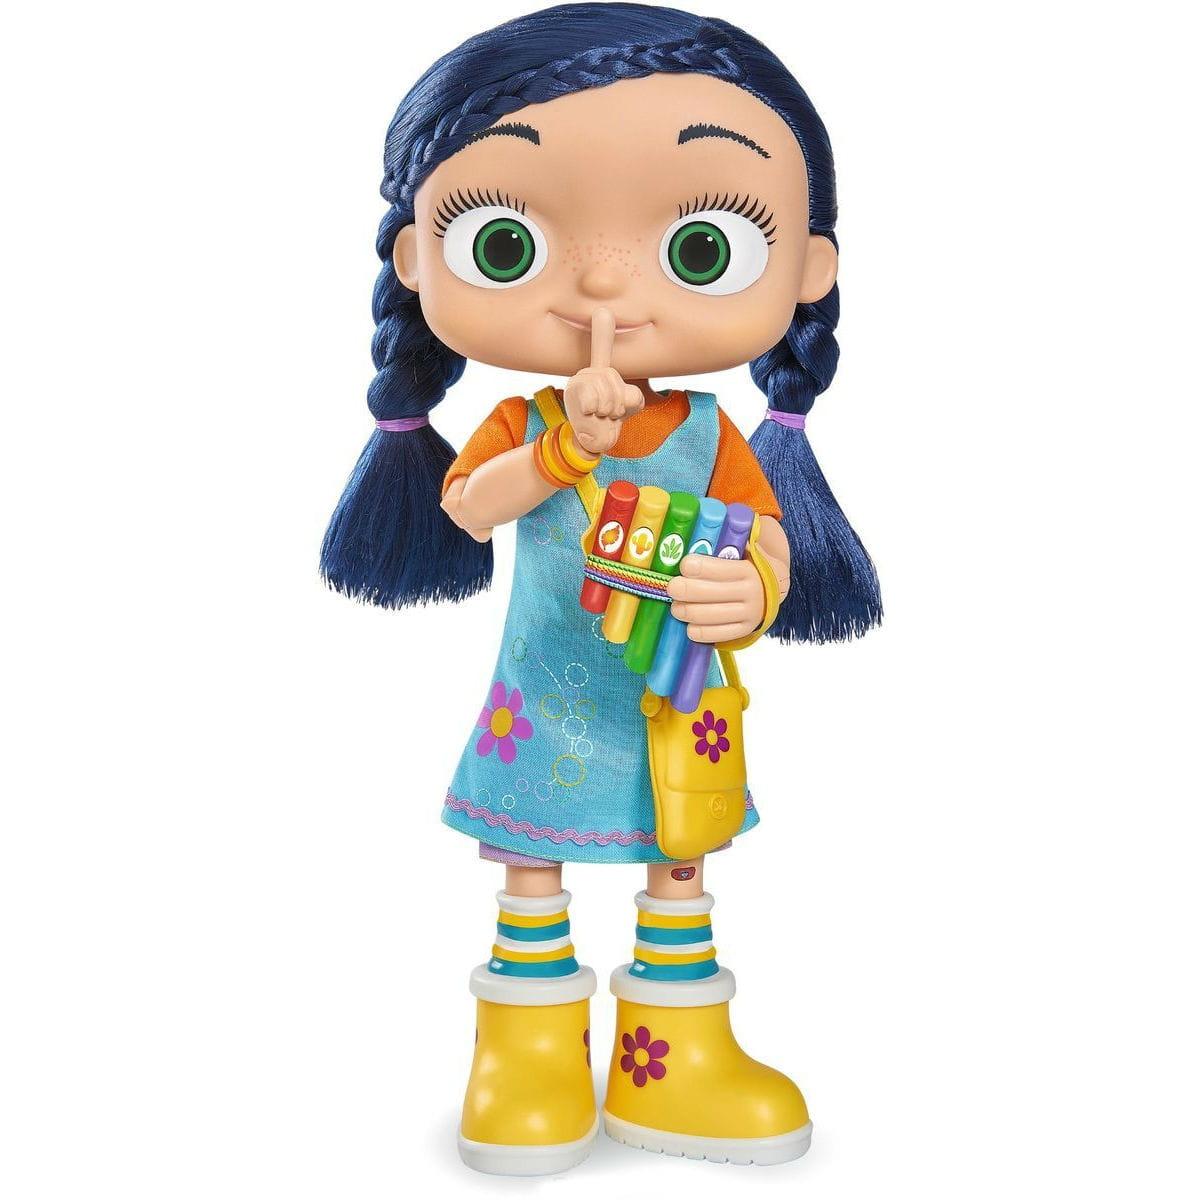 Интерактивная кукла SIMBA Висспер Wissper